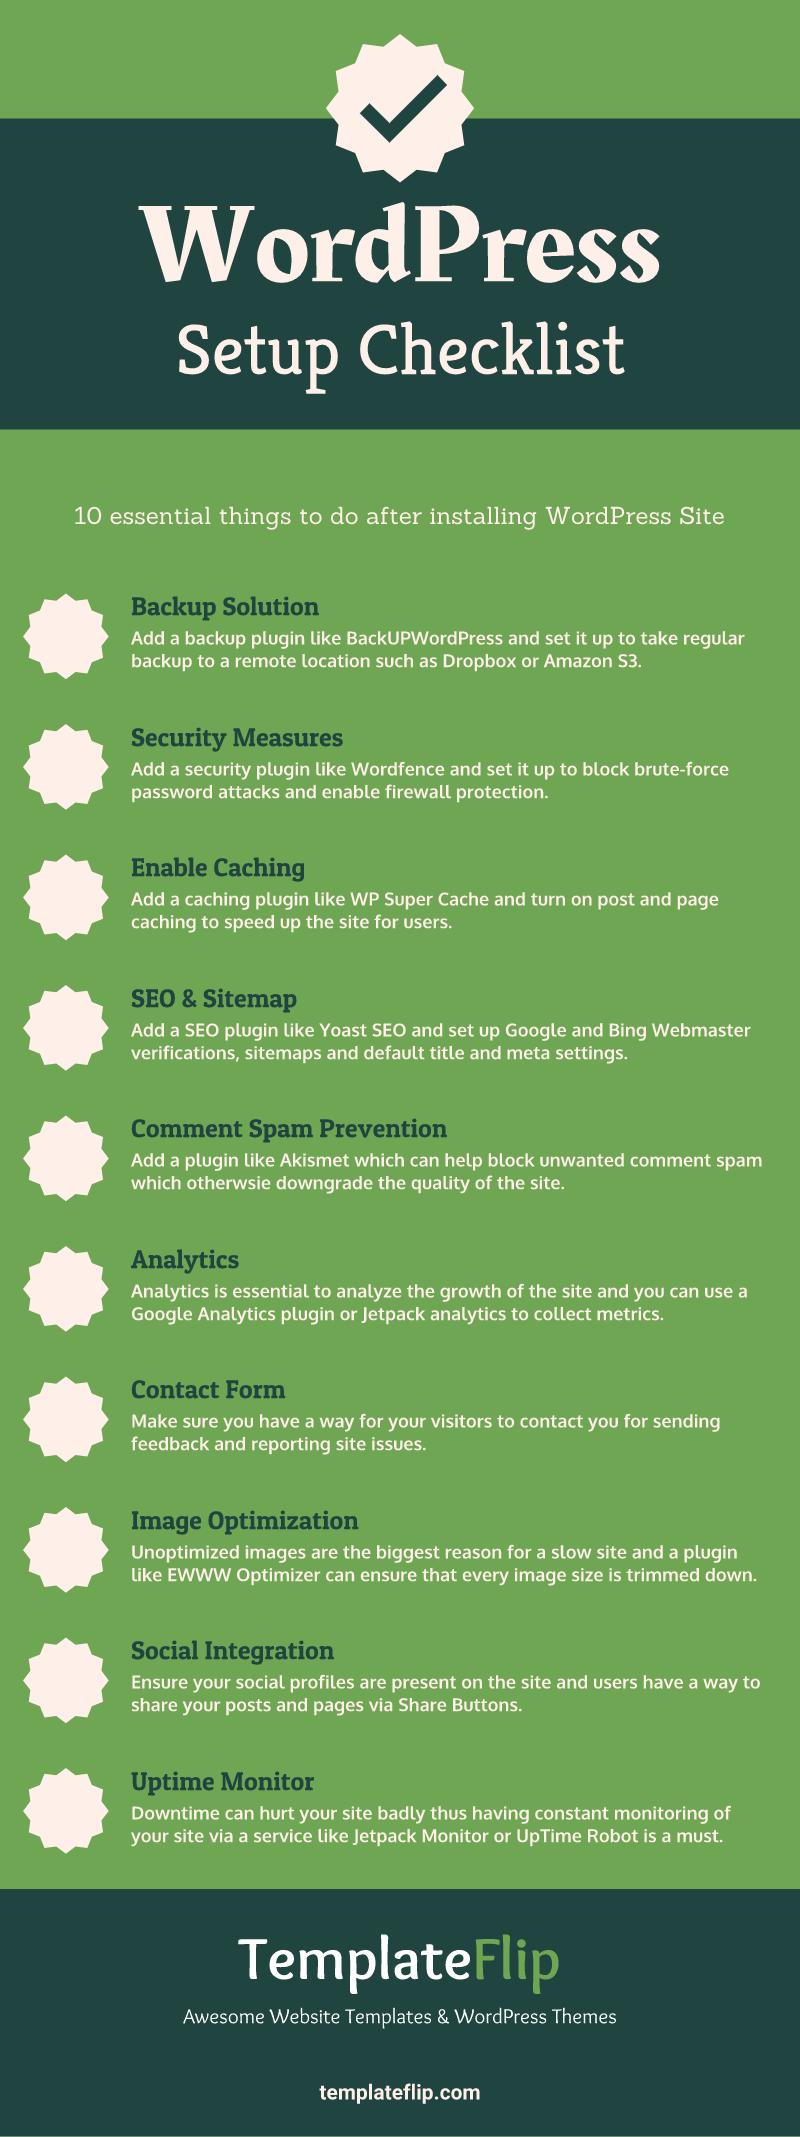 WordPress Setup Checklist Infographic